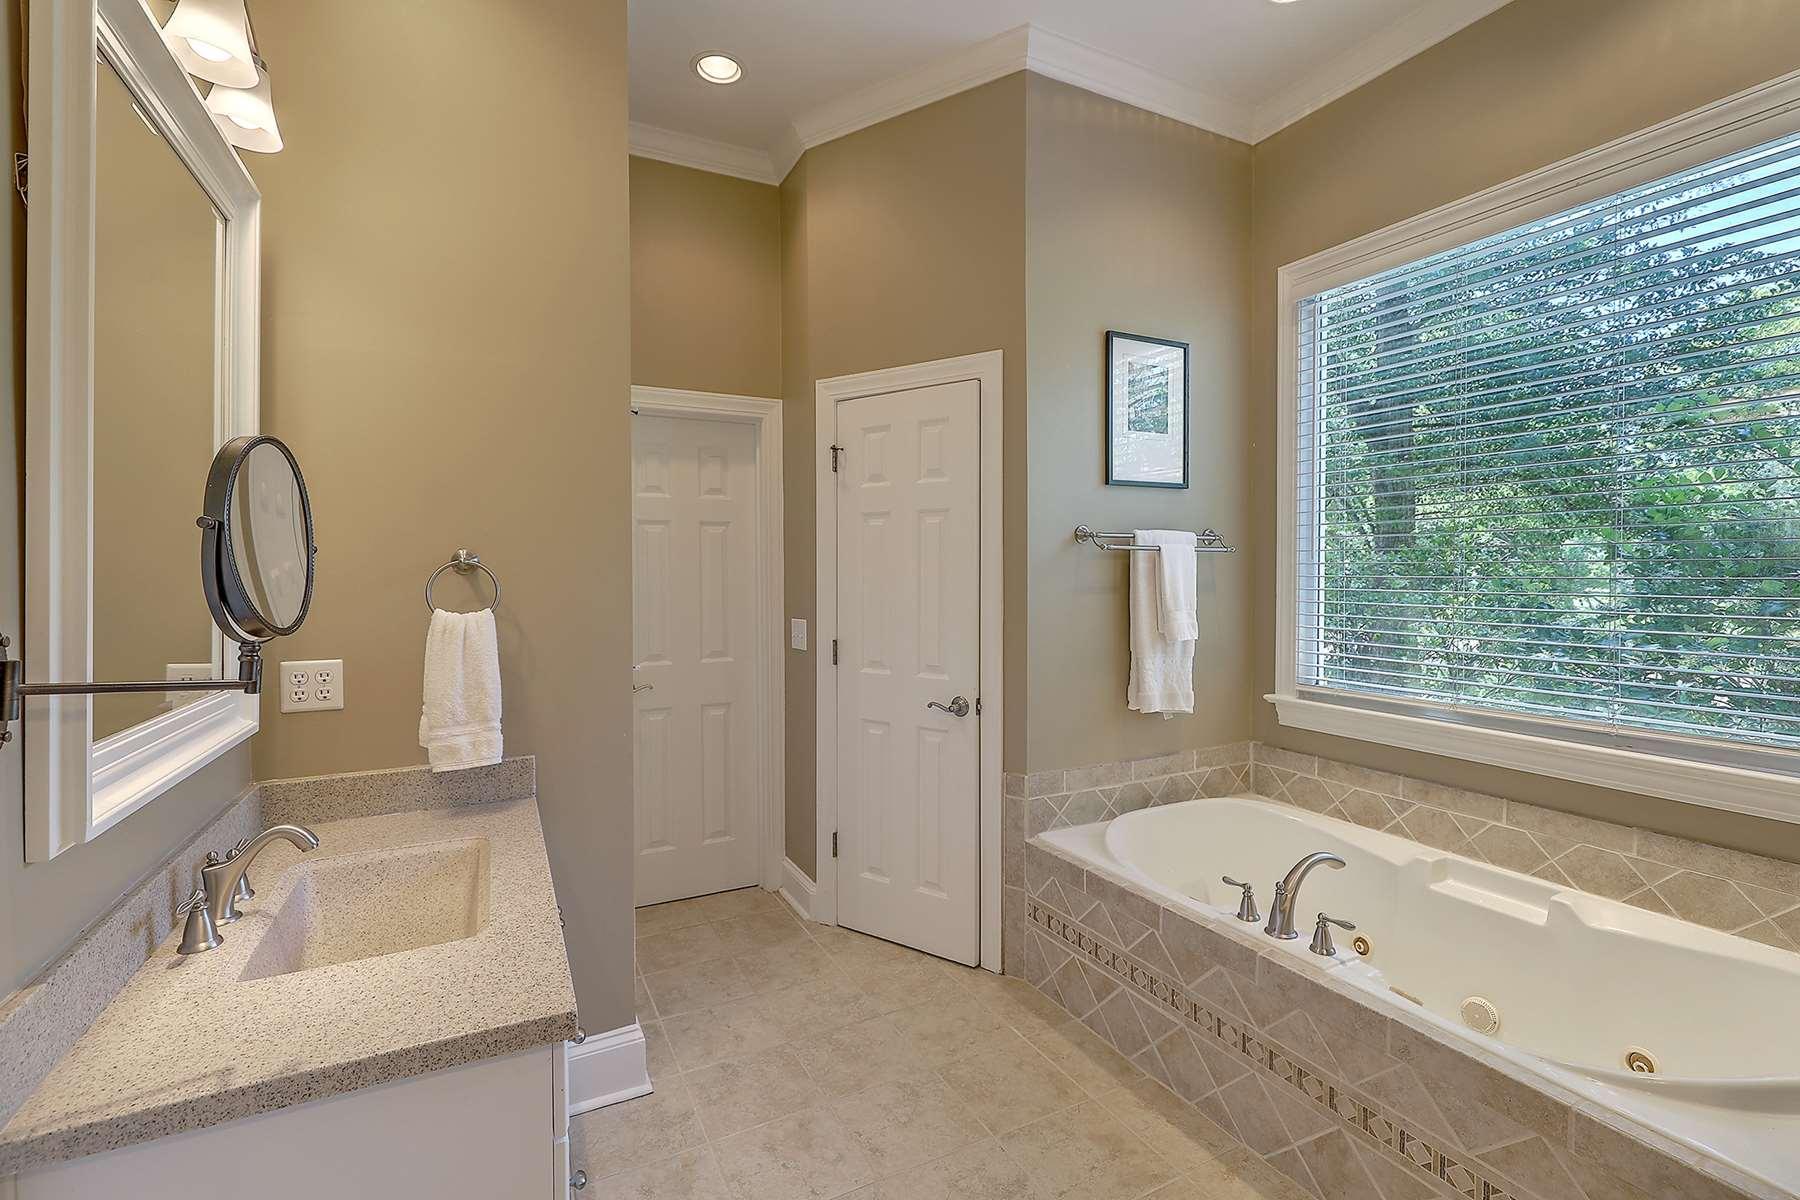 Dunes West Homes For Sale - 2961 Pignatelli, Mount Pleasant, SC - 15